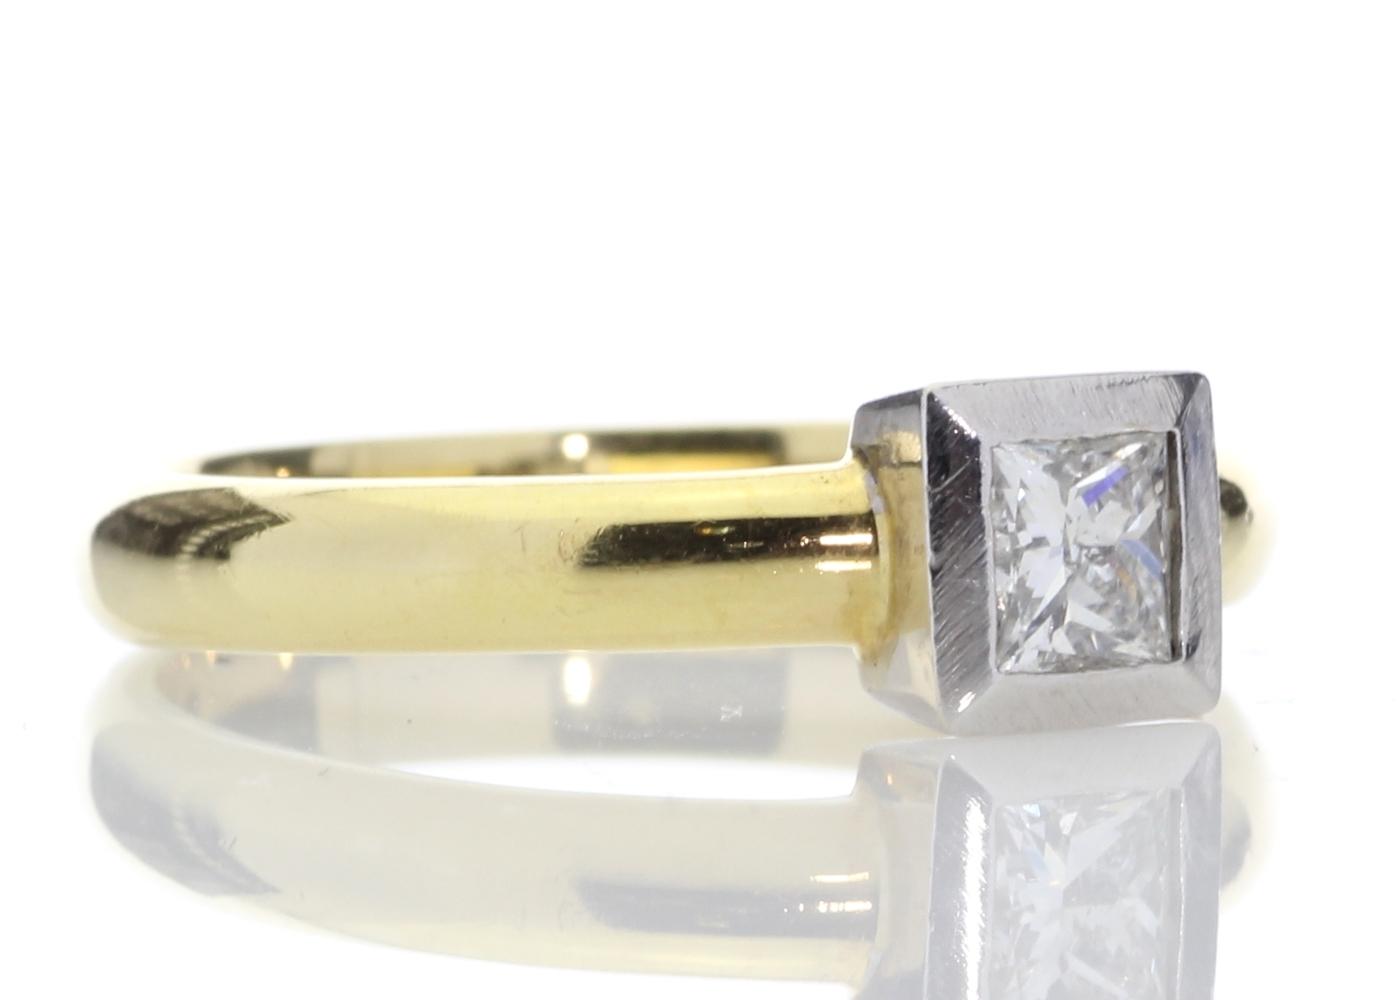 18ct Princess Cut Rub Over Diamond Ring 0.45 Carats - Image 4 of 8